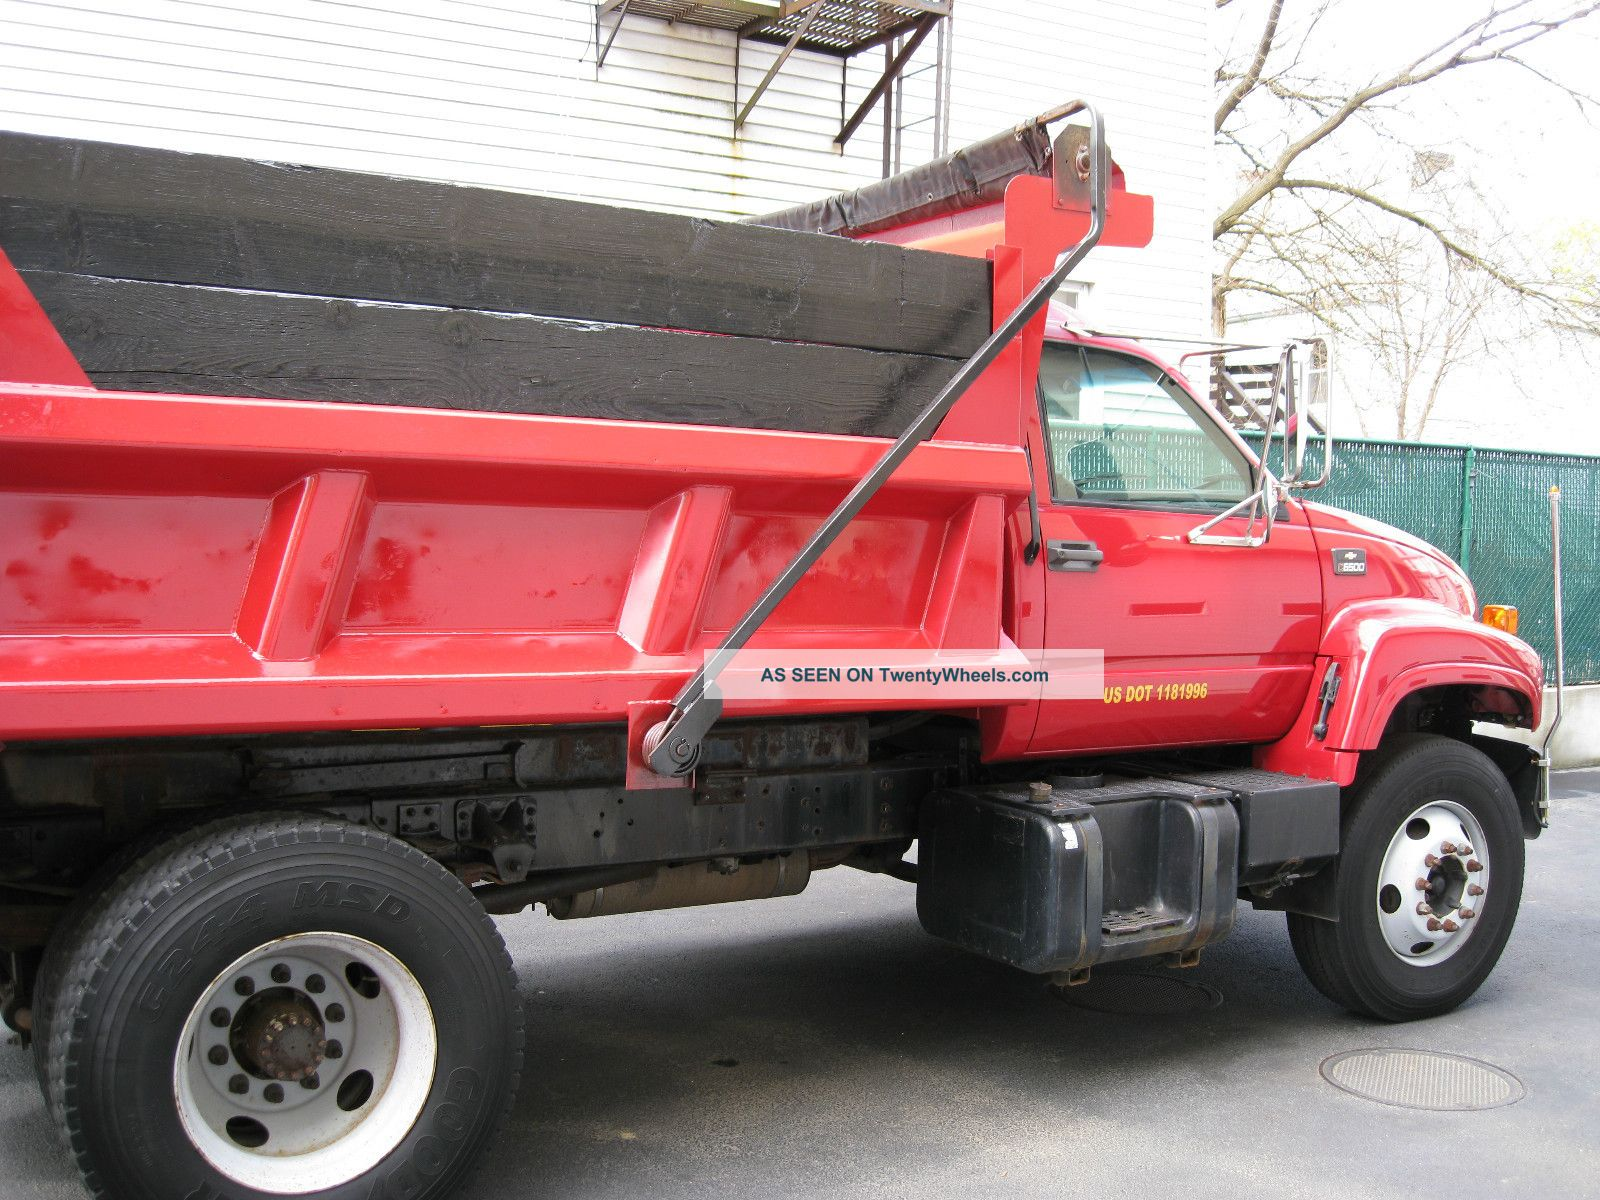 2000 chevrolet heavy duty dump truck c6500. Black Bedroom Furniture Sets. Home Design Ideas